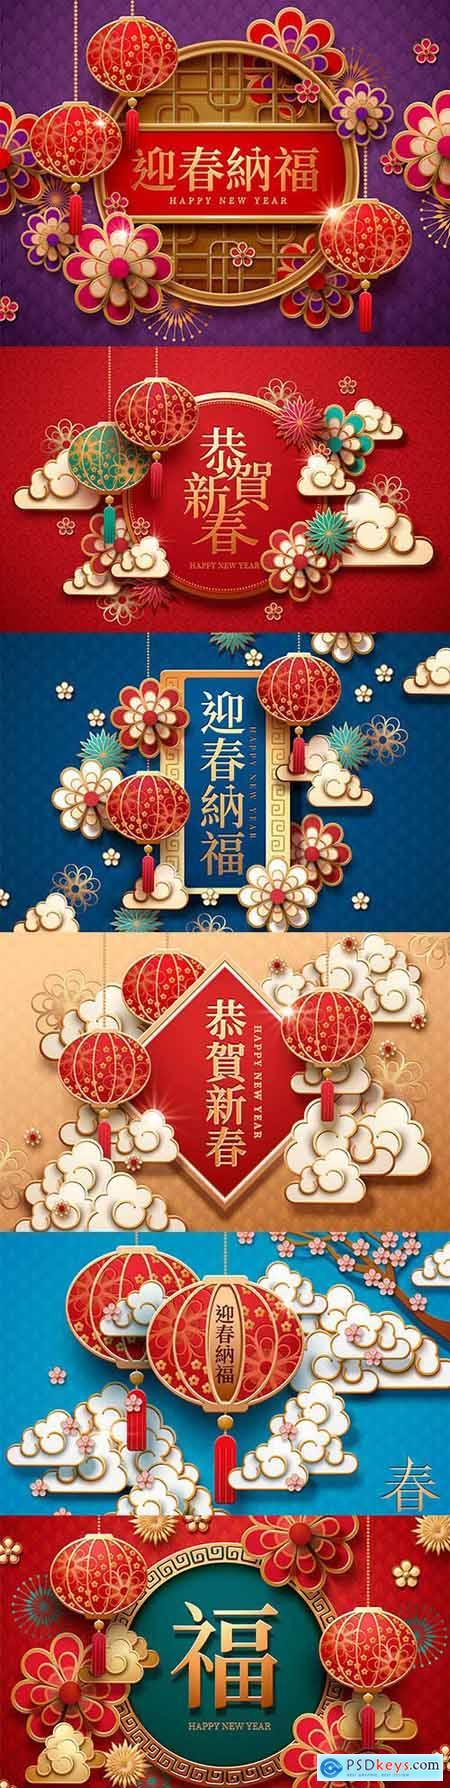 Happy New Year words written in hanzi on spring verse